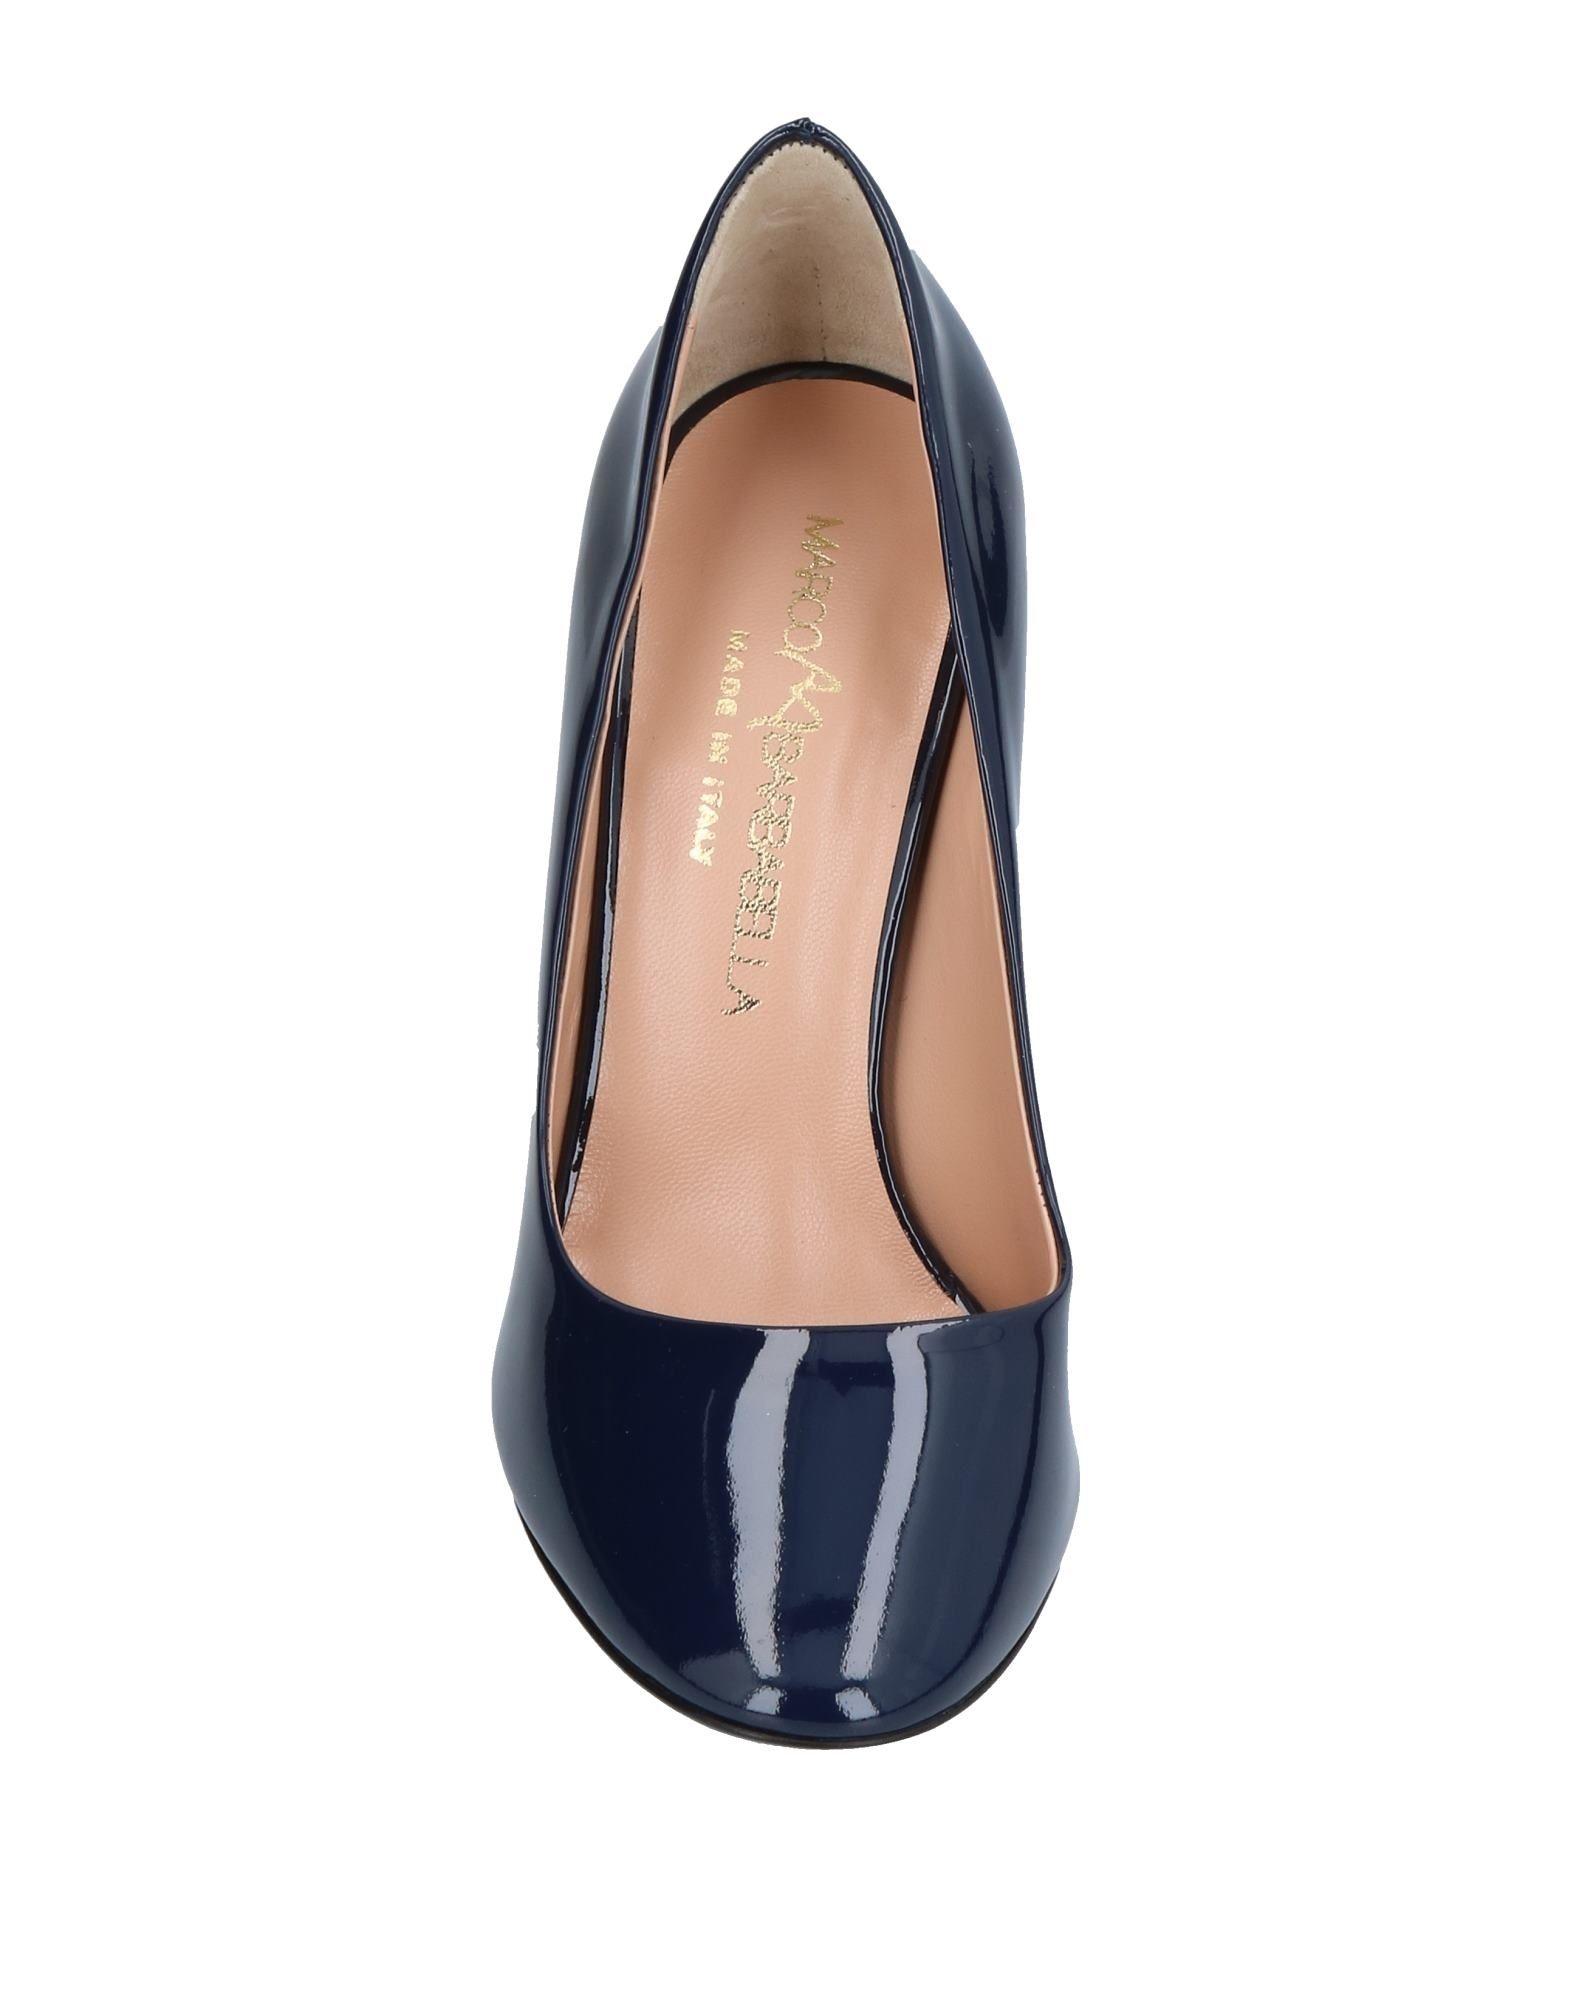 Stilvolle billige Schuhe Marco 11342239LO Barbabella Pumps Damen  11342239LO Marco 7c7743